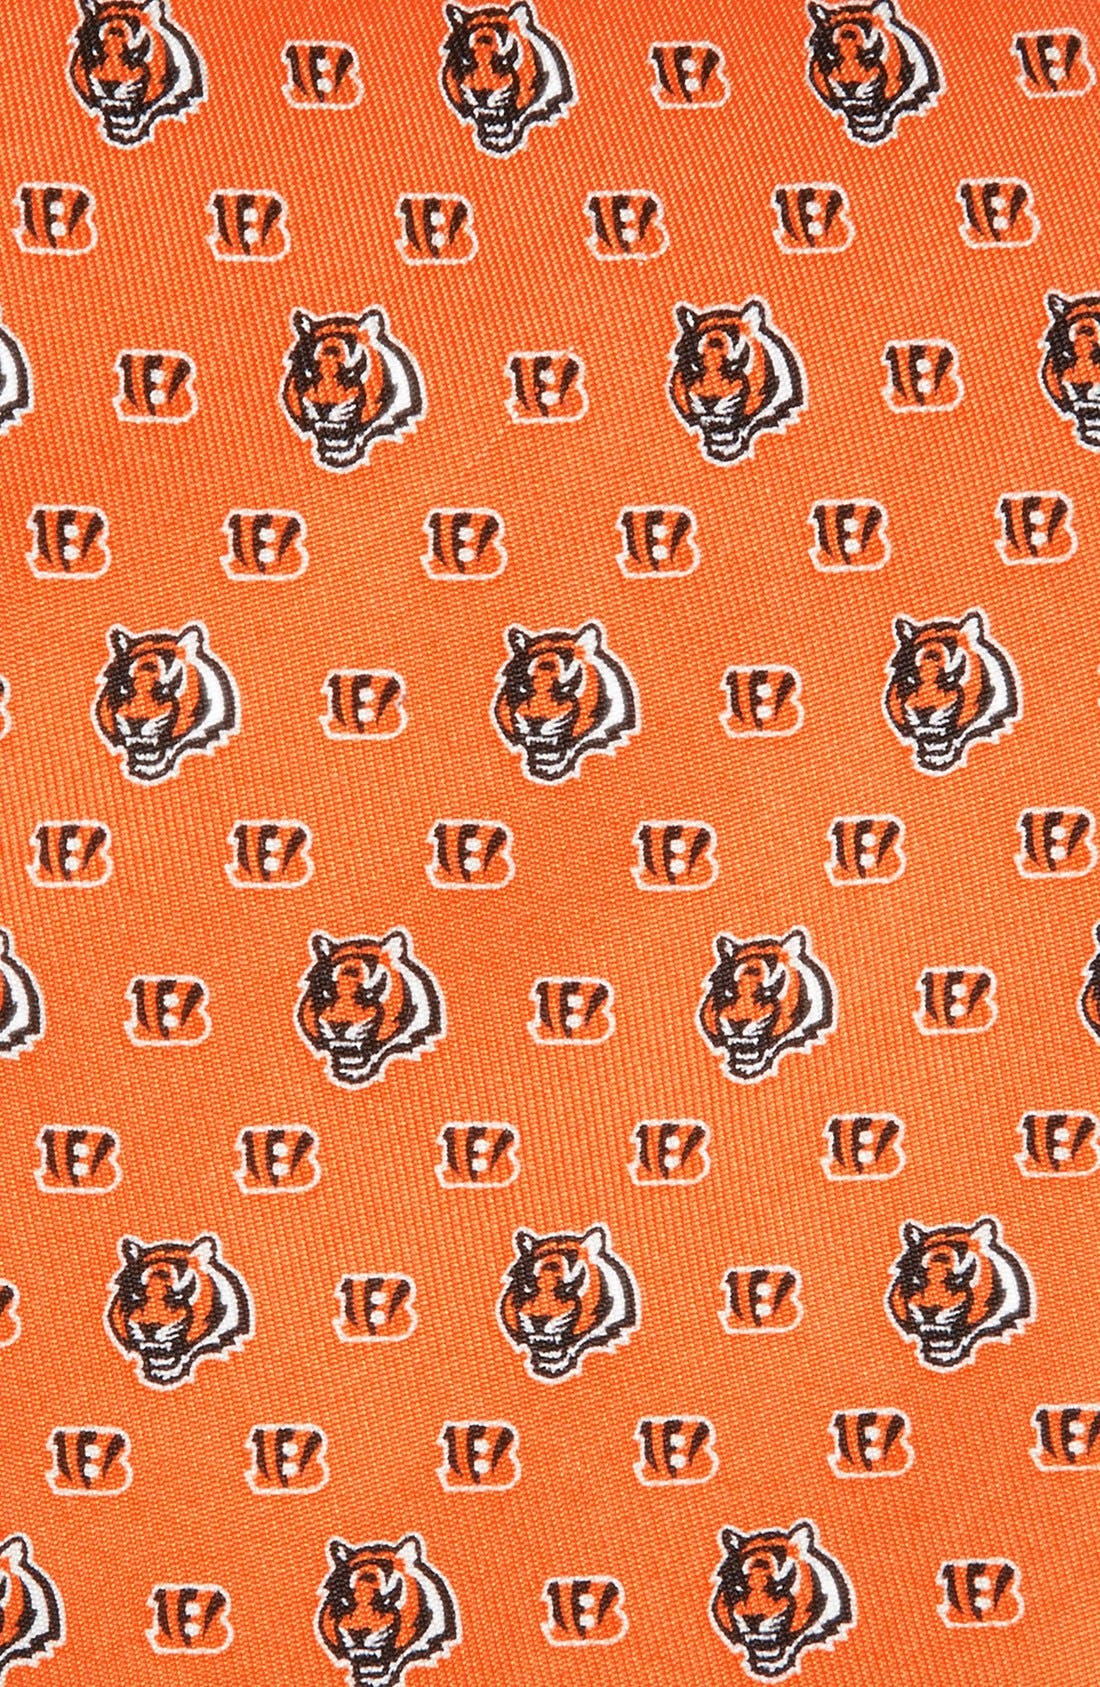 Cincinnati Bengals - NFL Woven Silk Tie,                             Alternate thumbnail 2, color,                             ORANGE